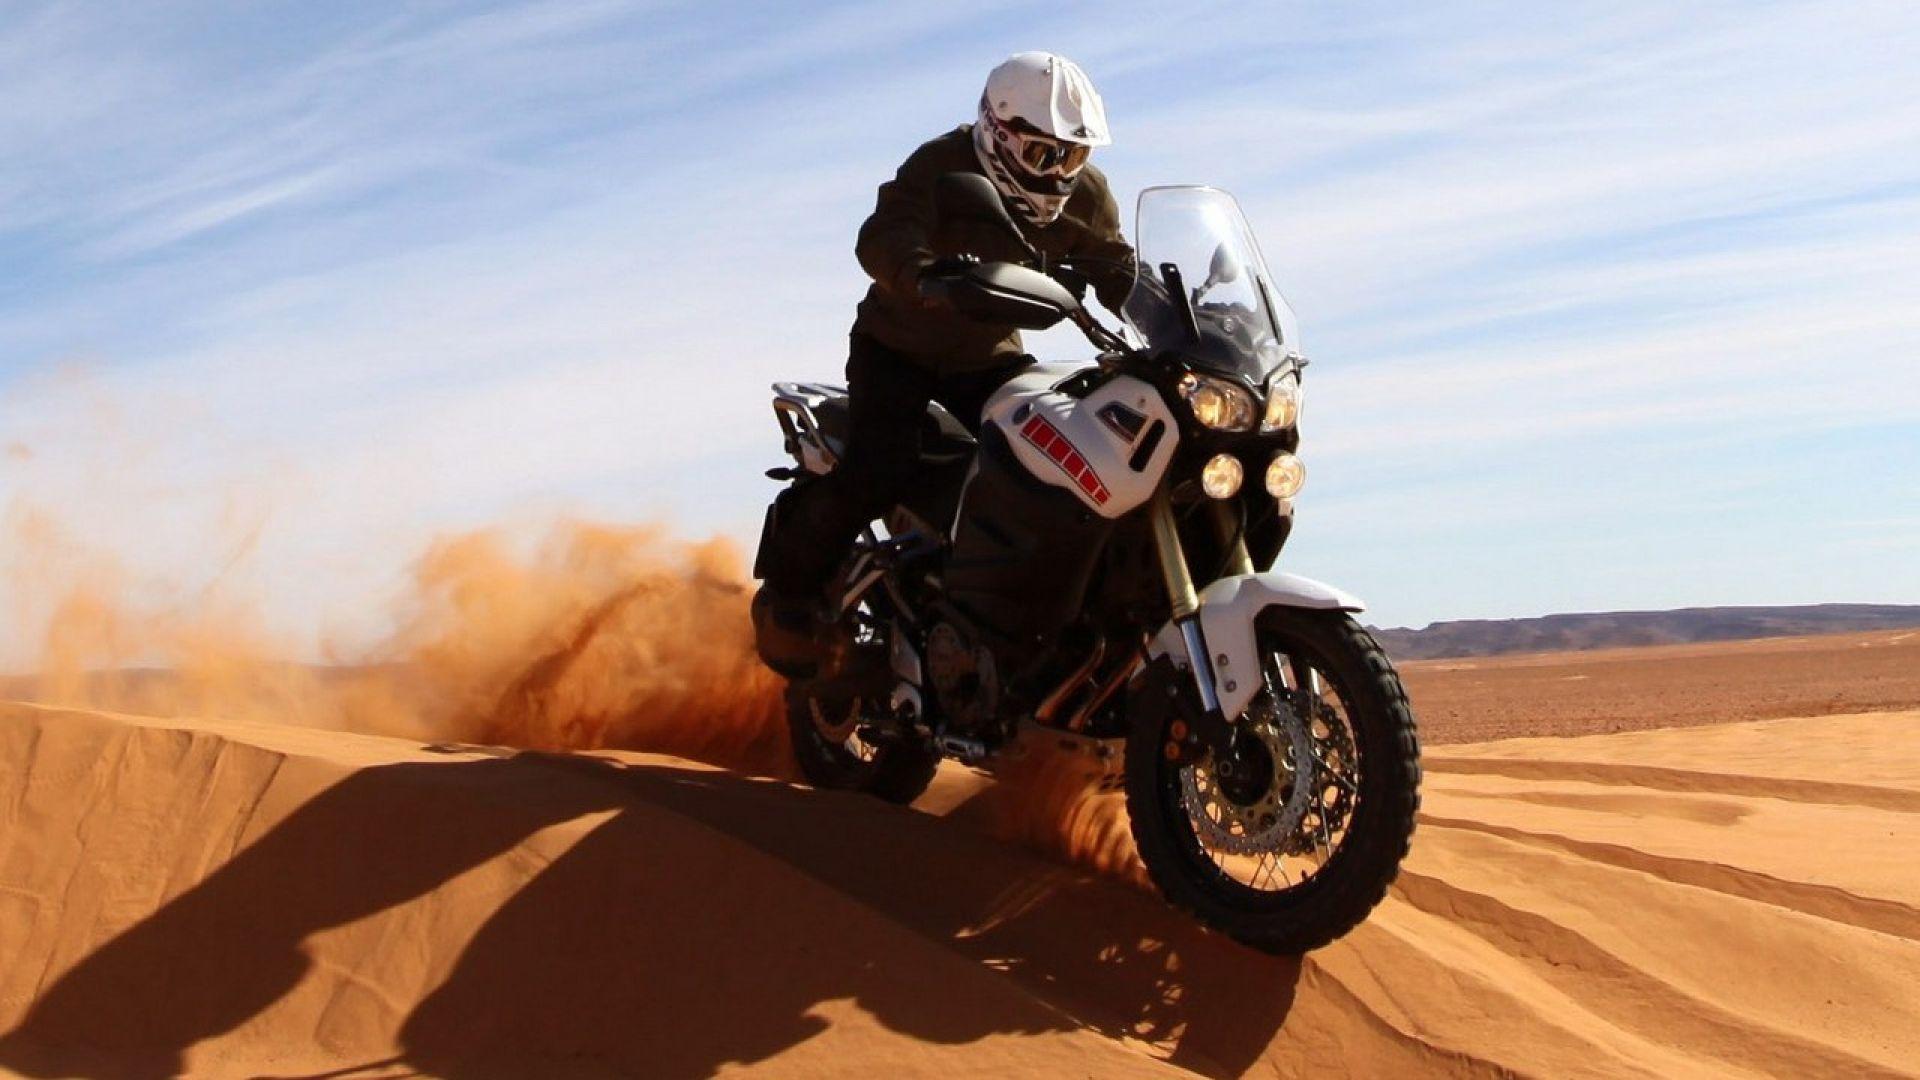 Immagine 97: In Marocco con la Yamaha Super Ténéré